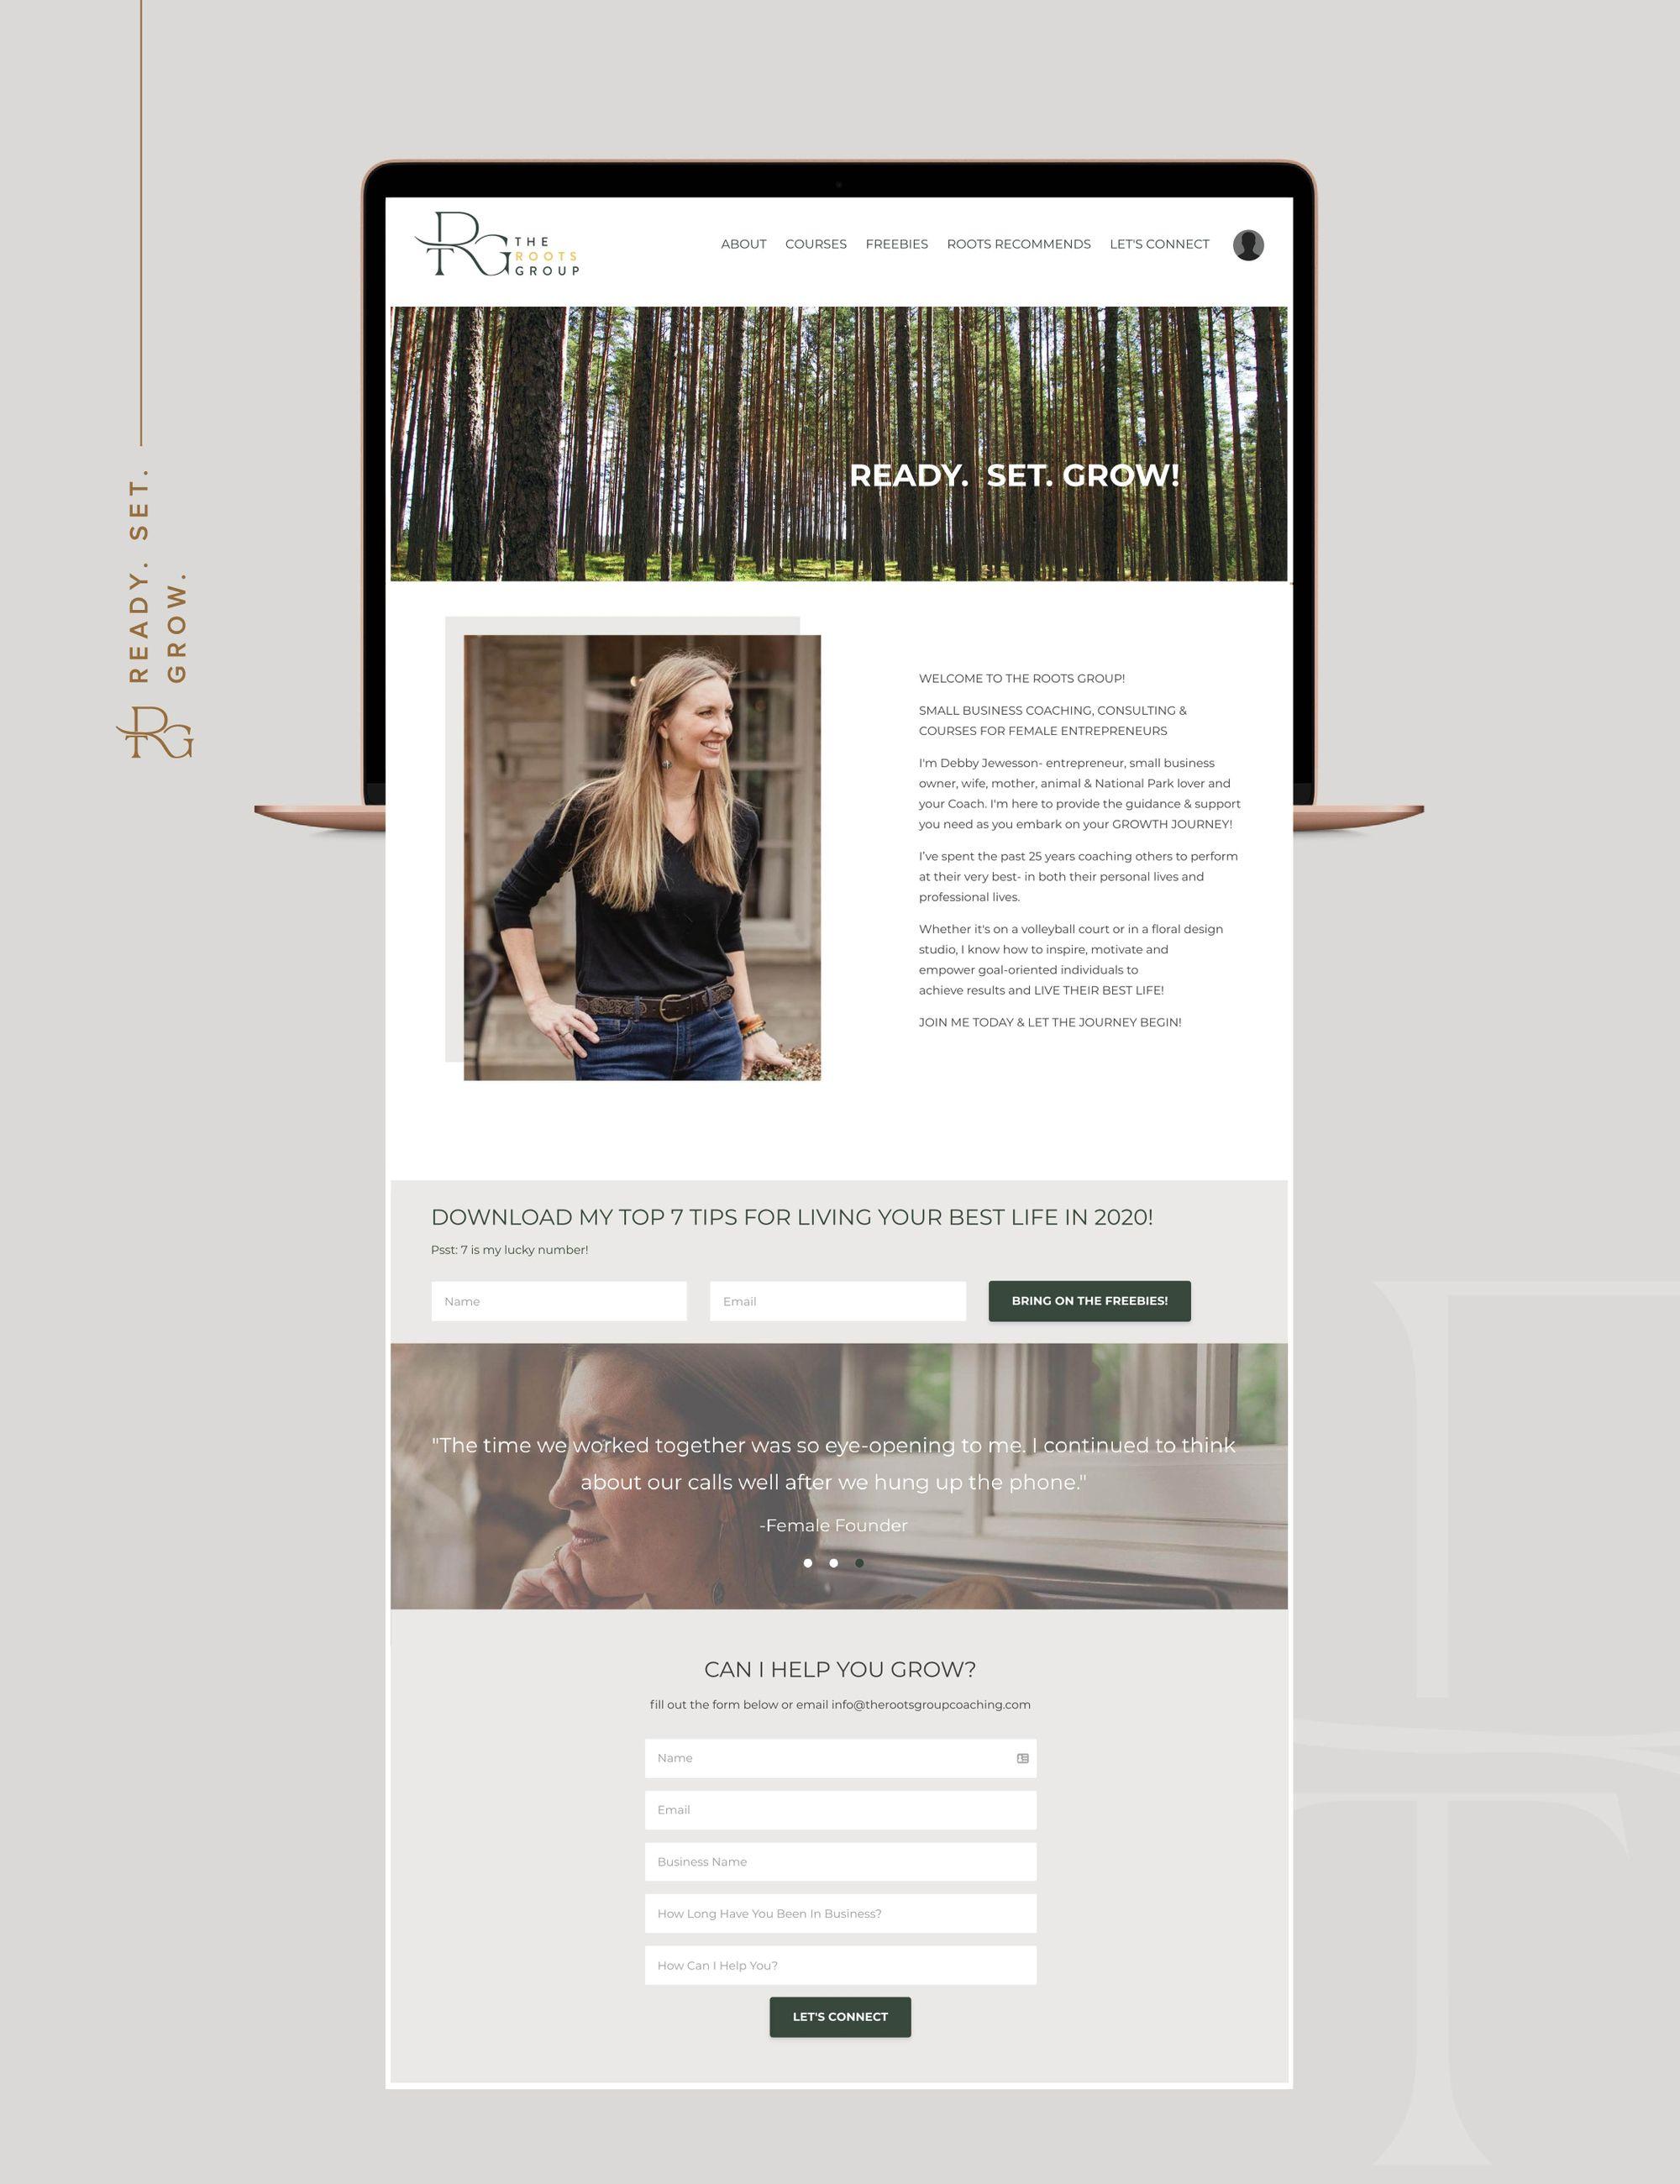 Custom Web Design Austin Texas In 2020 Custom Web Design Web Design Branding Website Design